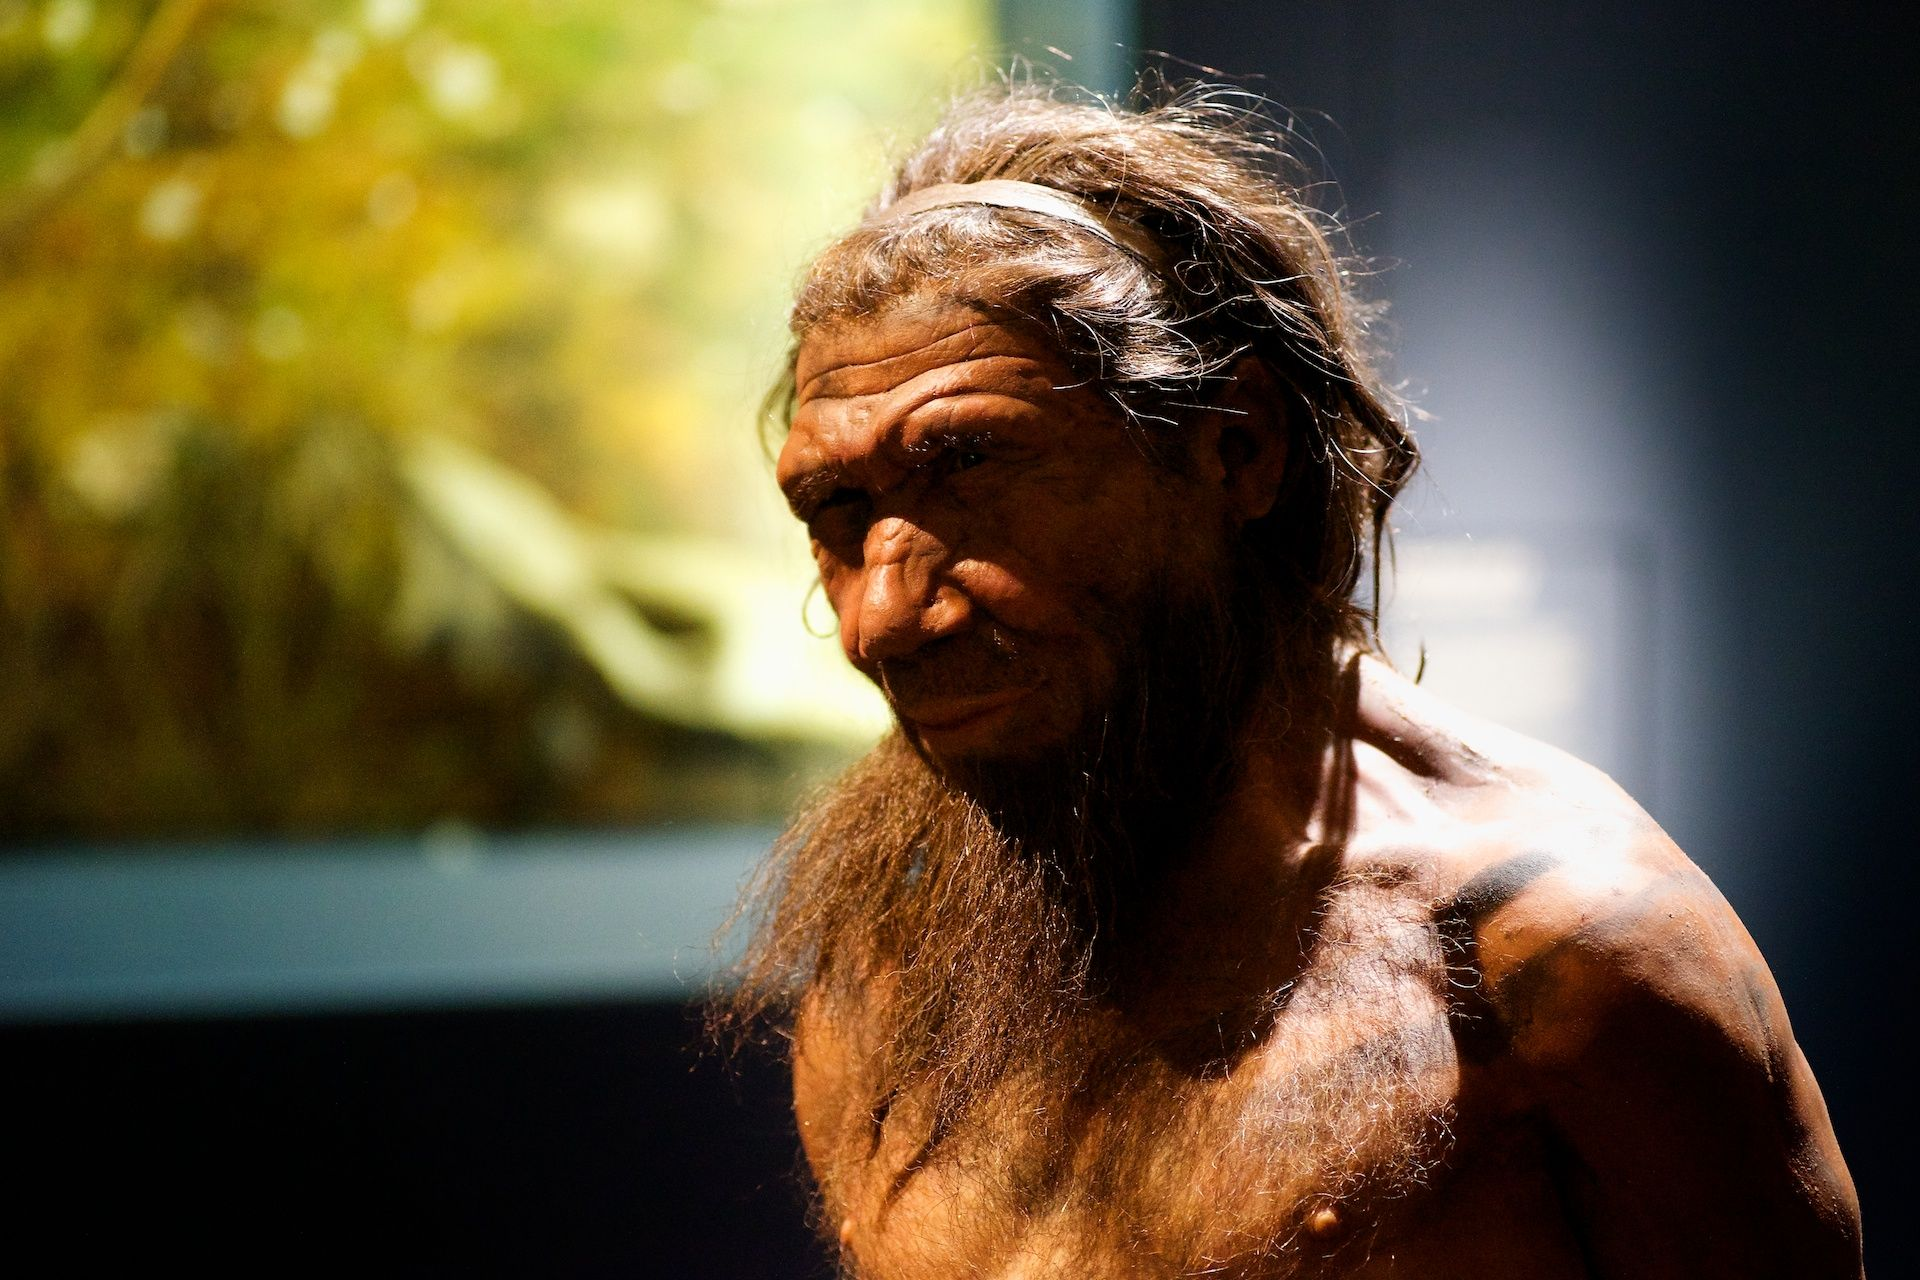 10_31_Neanderthal